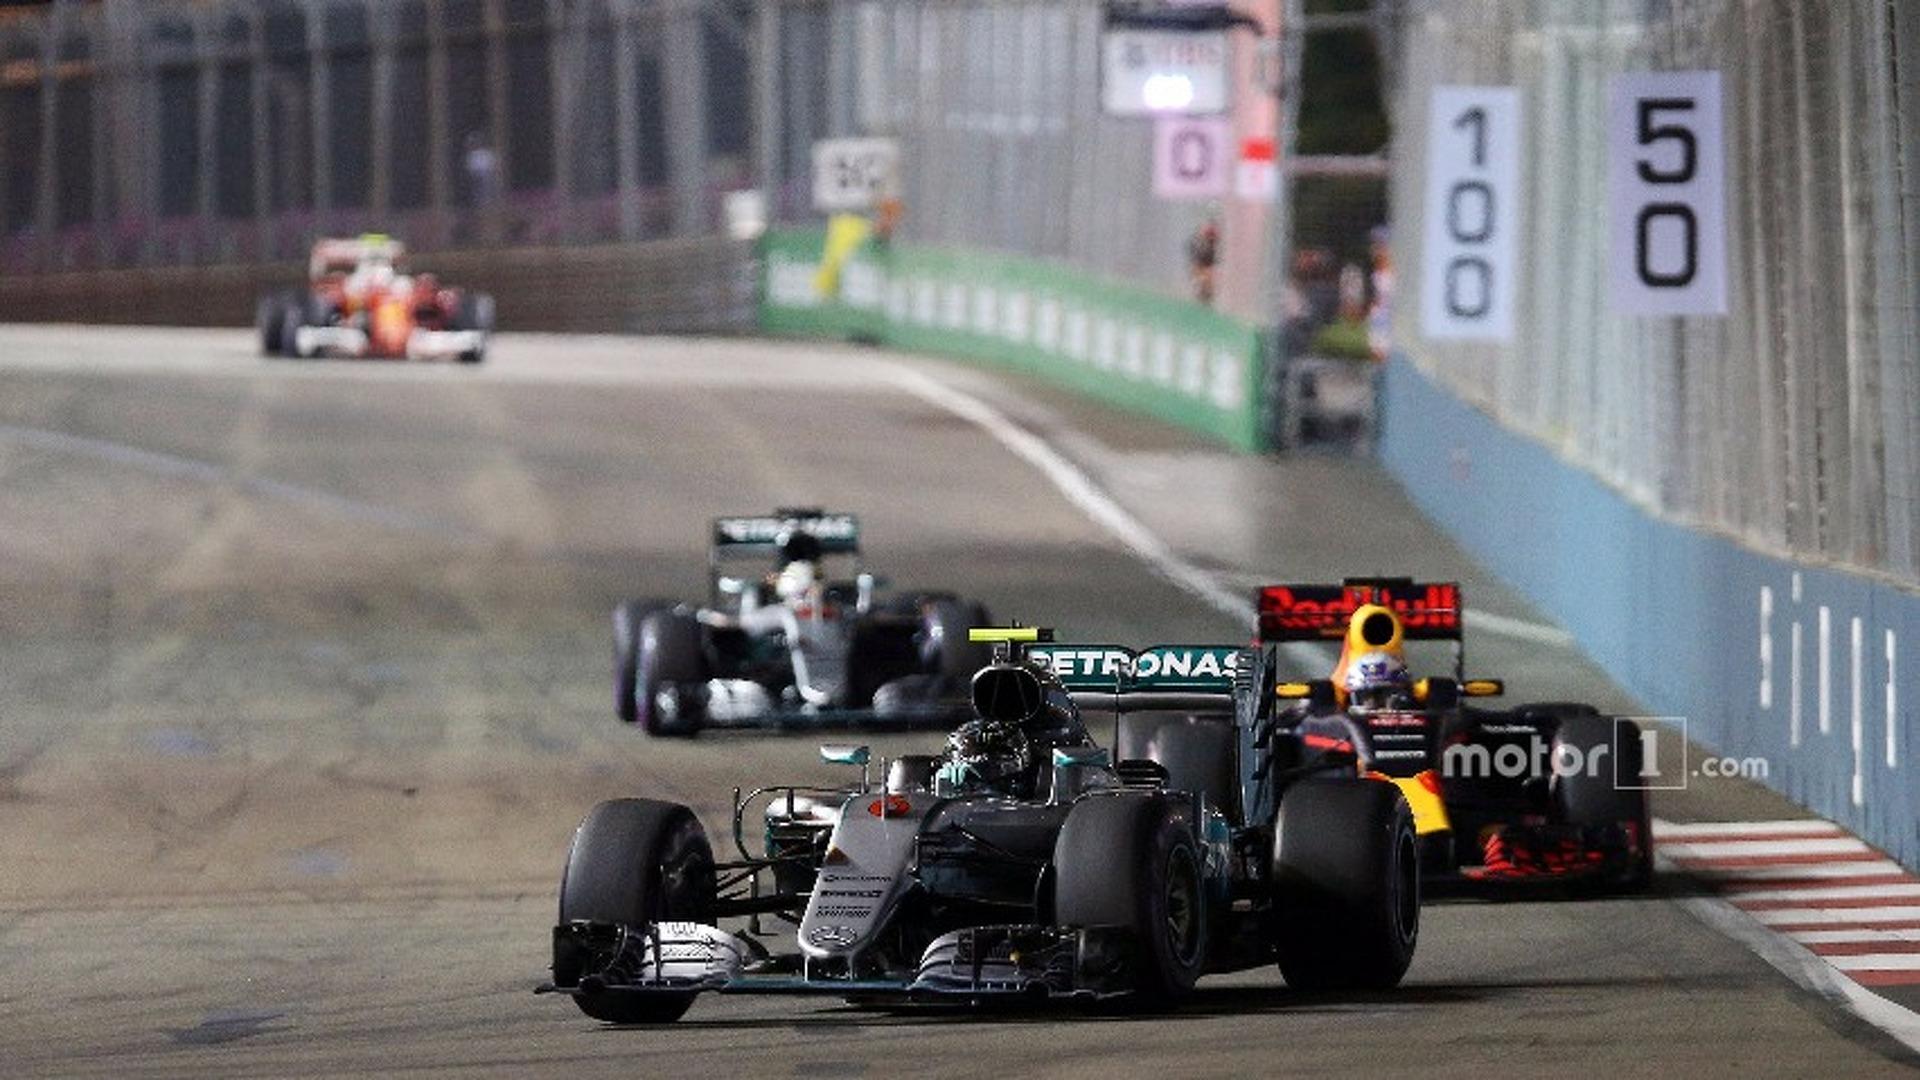 Analysis: How Hamilton's podium bid nearly toppled Rosberg